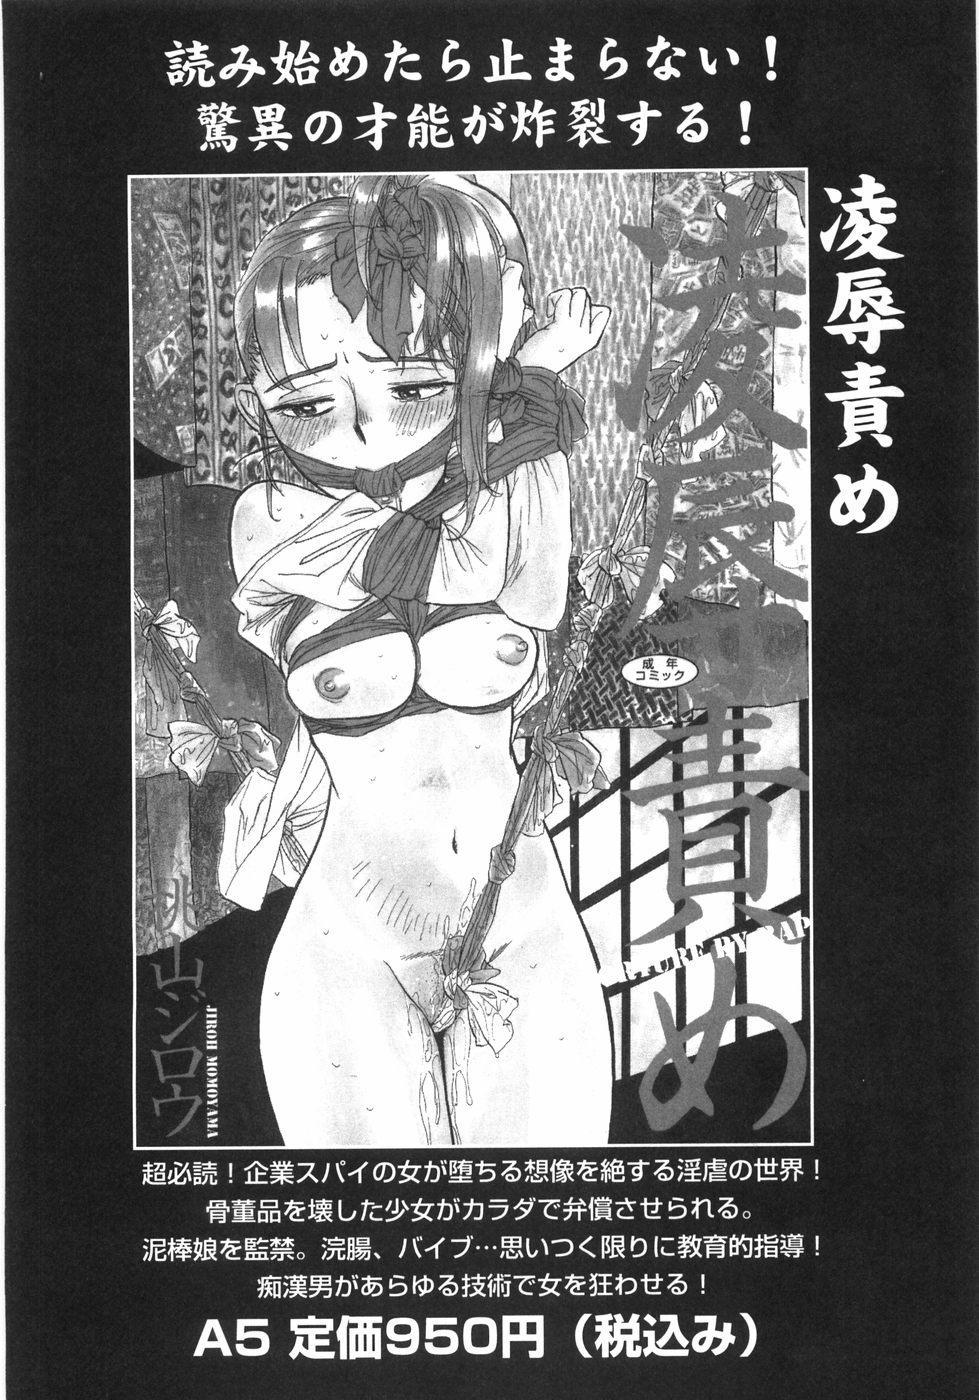 Ningyou no Yakata - The Doll House 170